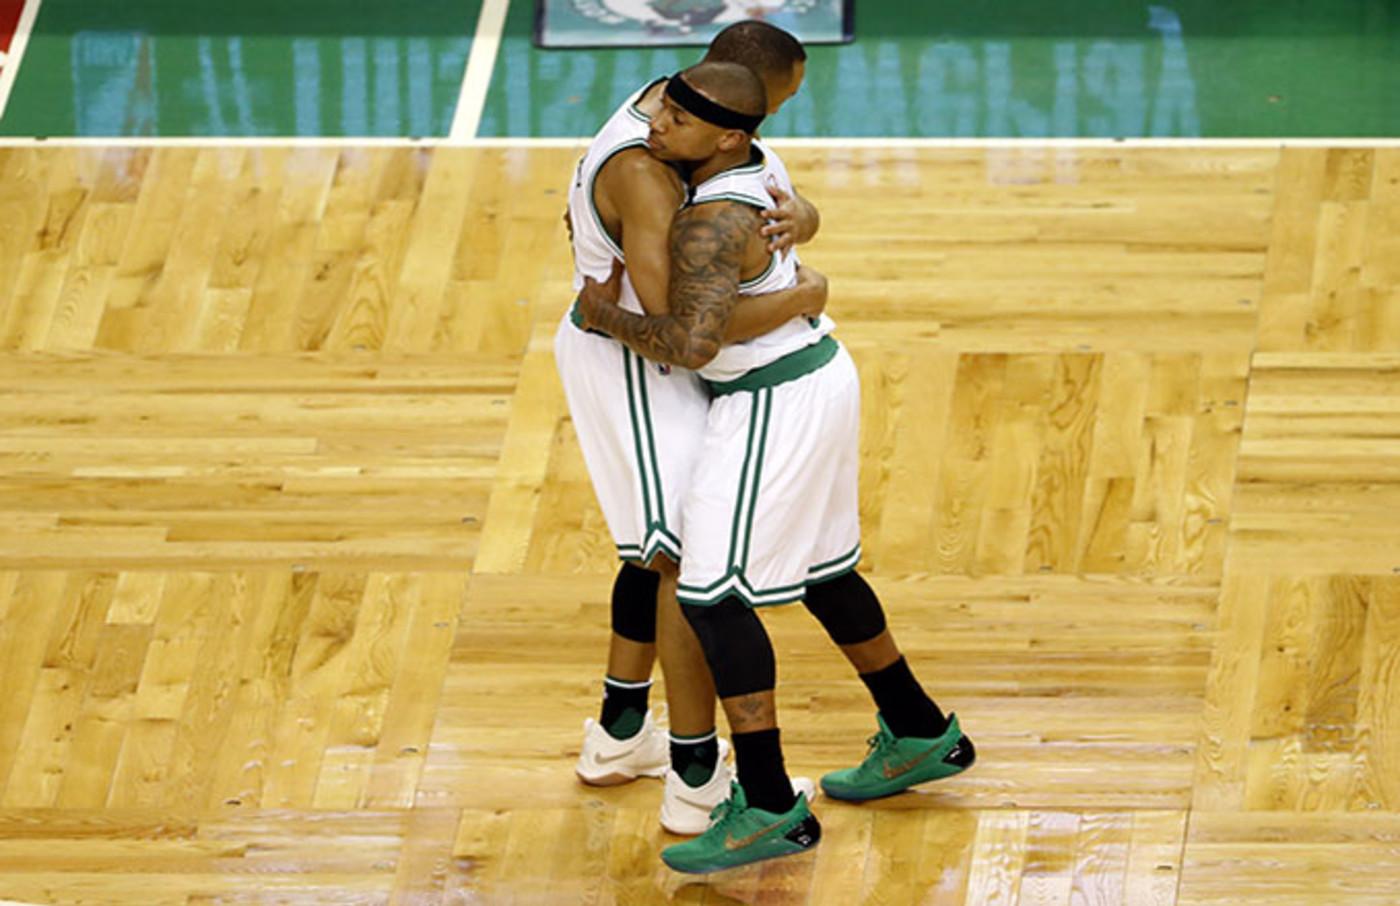 isaiah thomas celtics being hugged